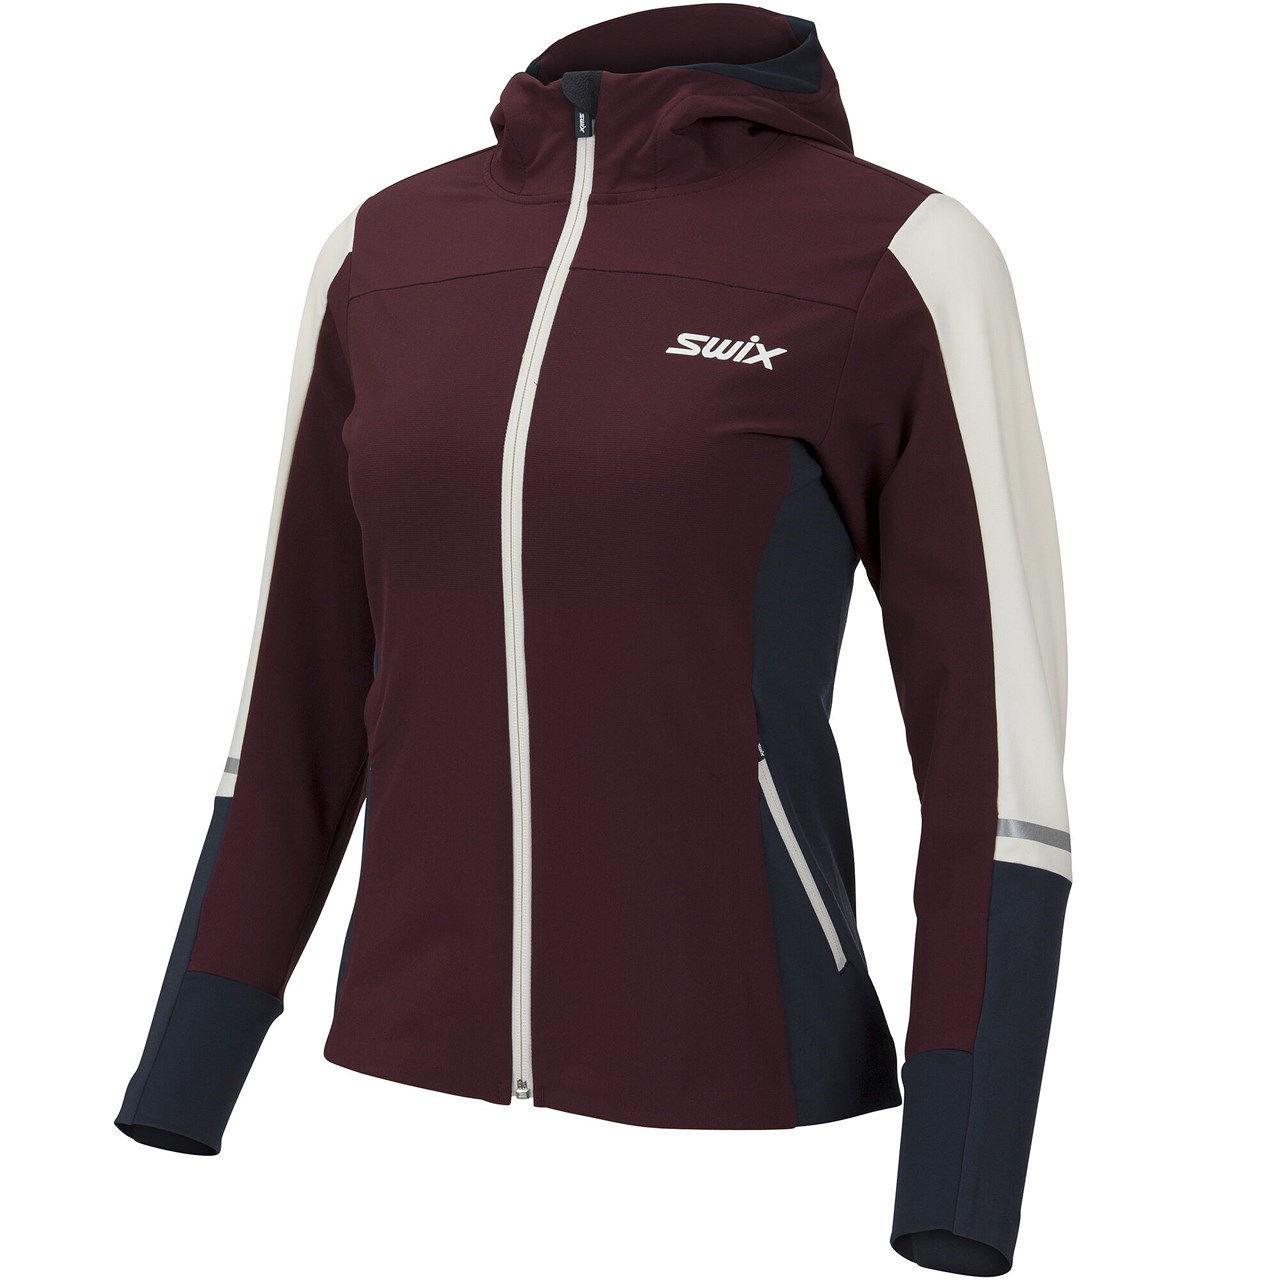 Bilde av Evolution softshield jacket W